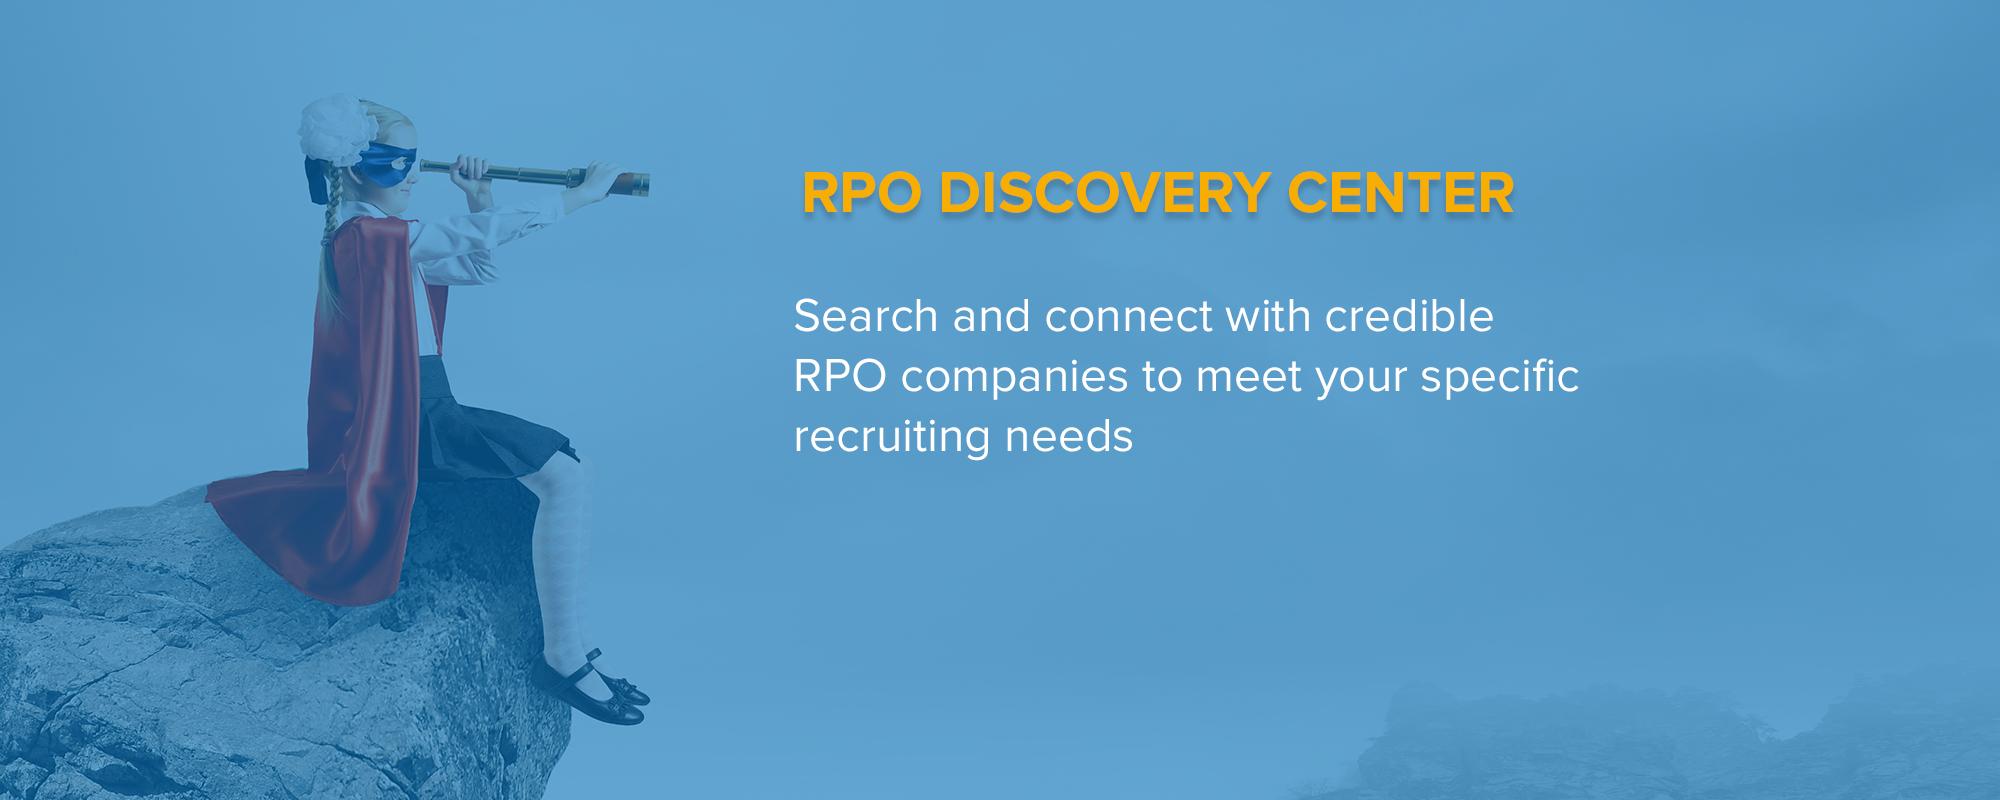 RPO Discovery Center-1